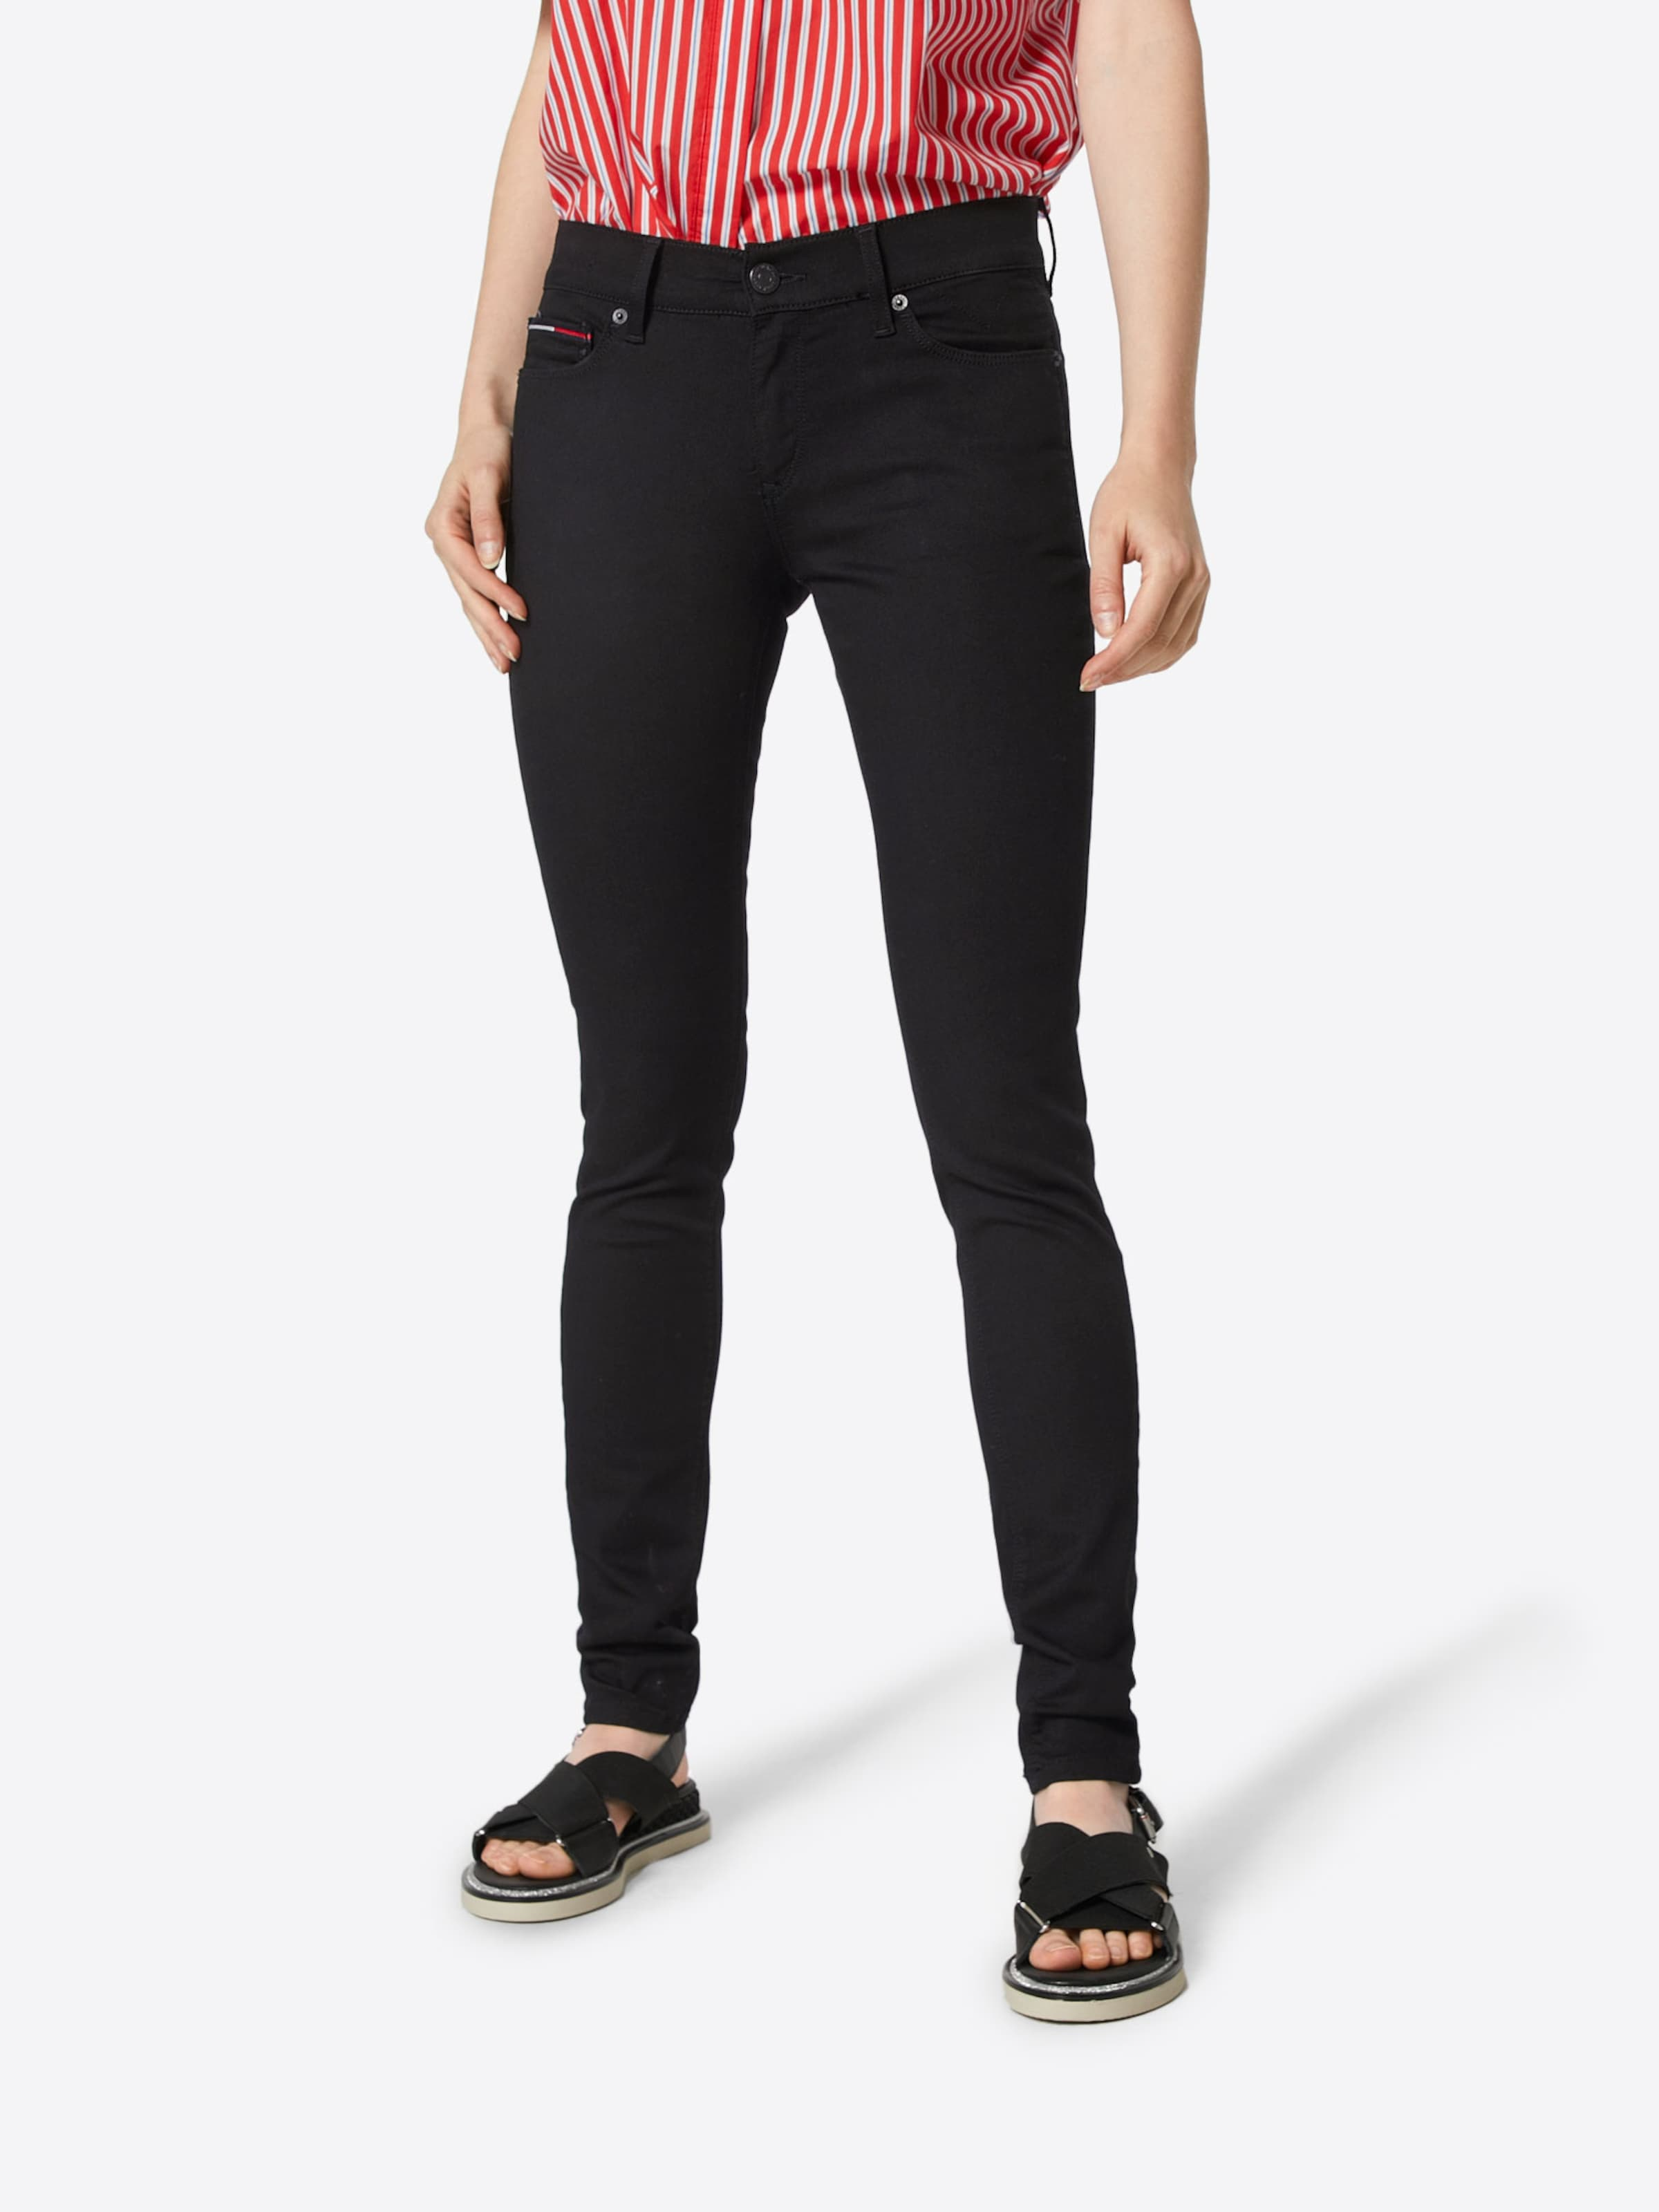 Black 'nora ' In Denim Jeans Tommy hdxotQBCsr